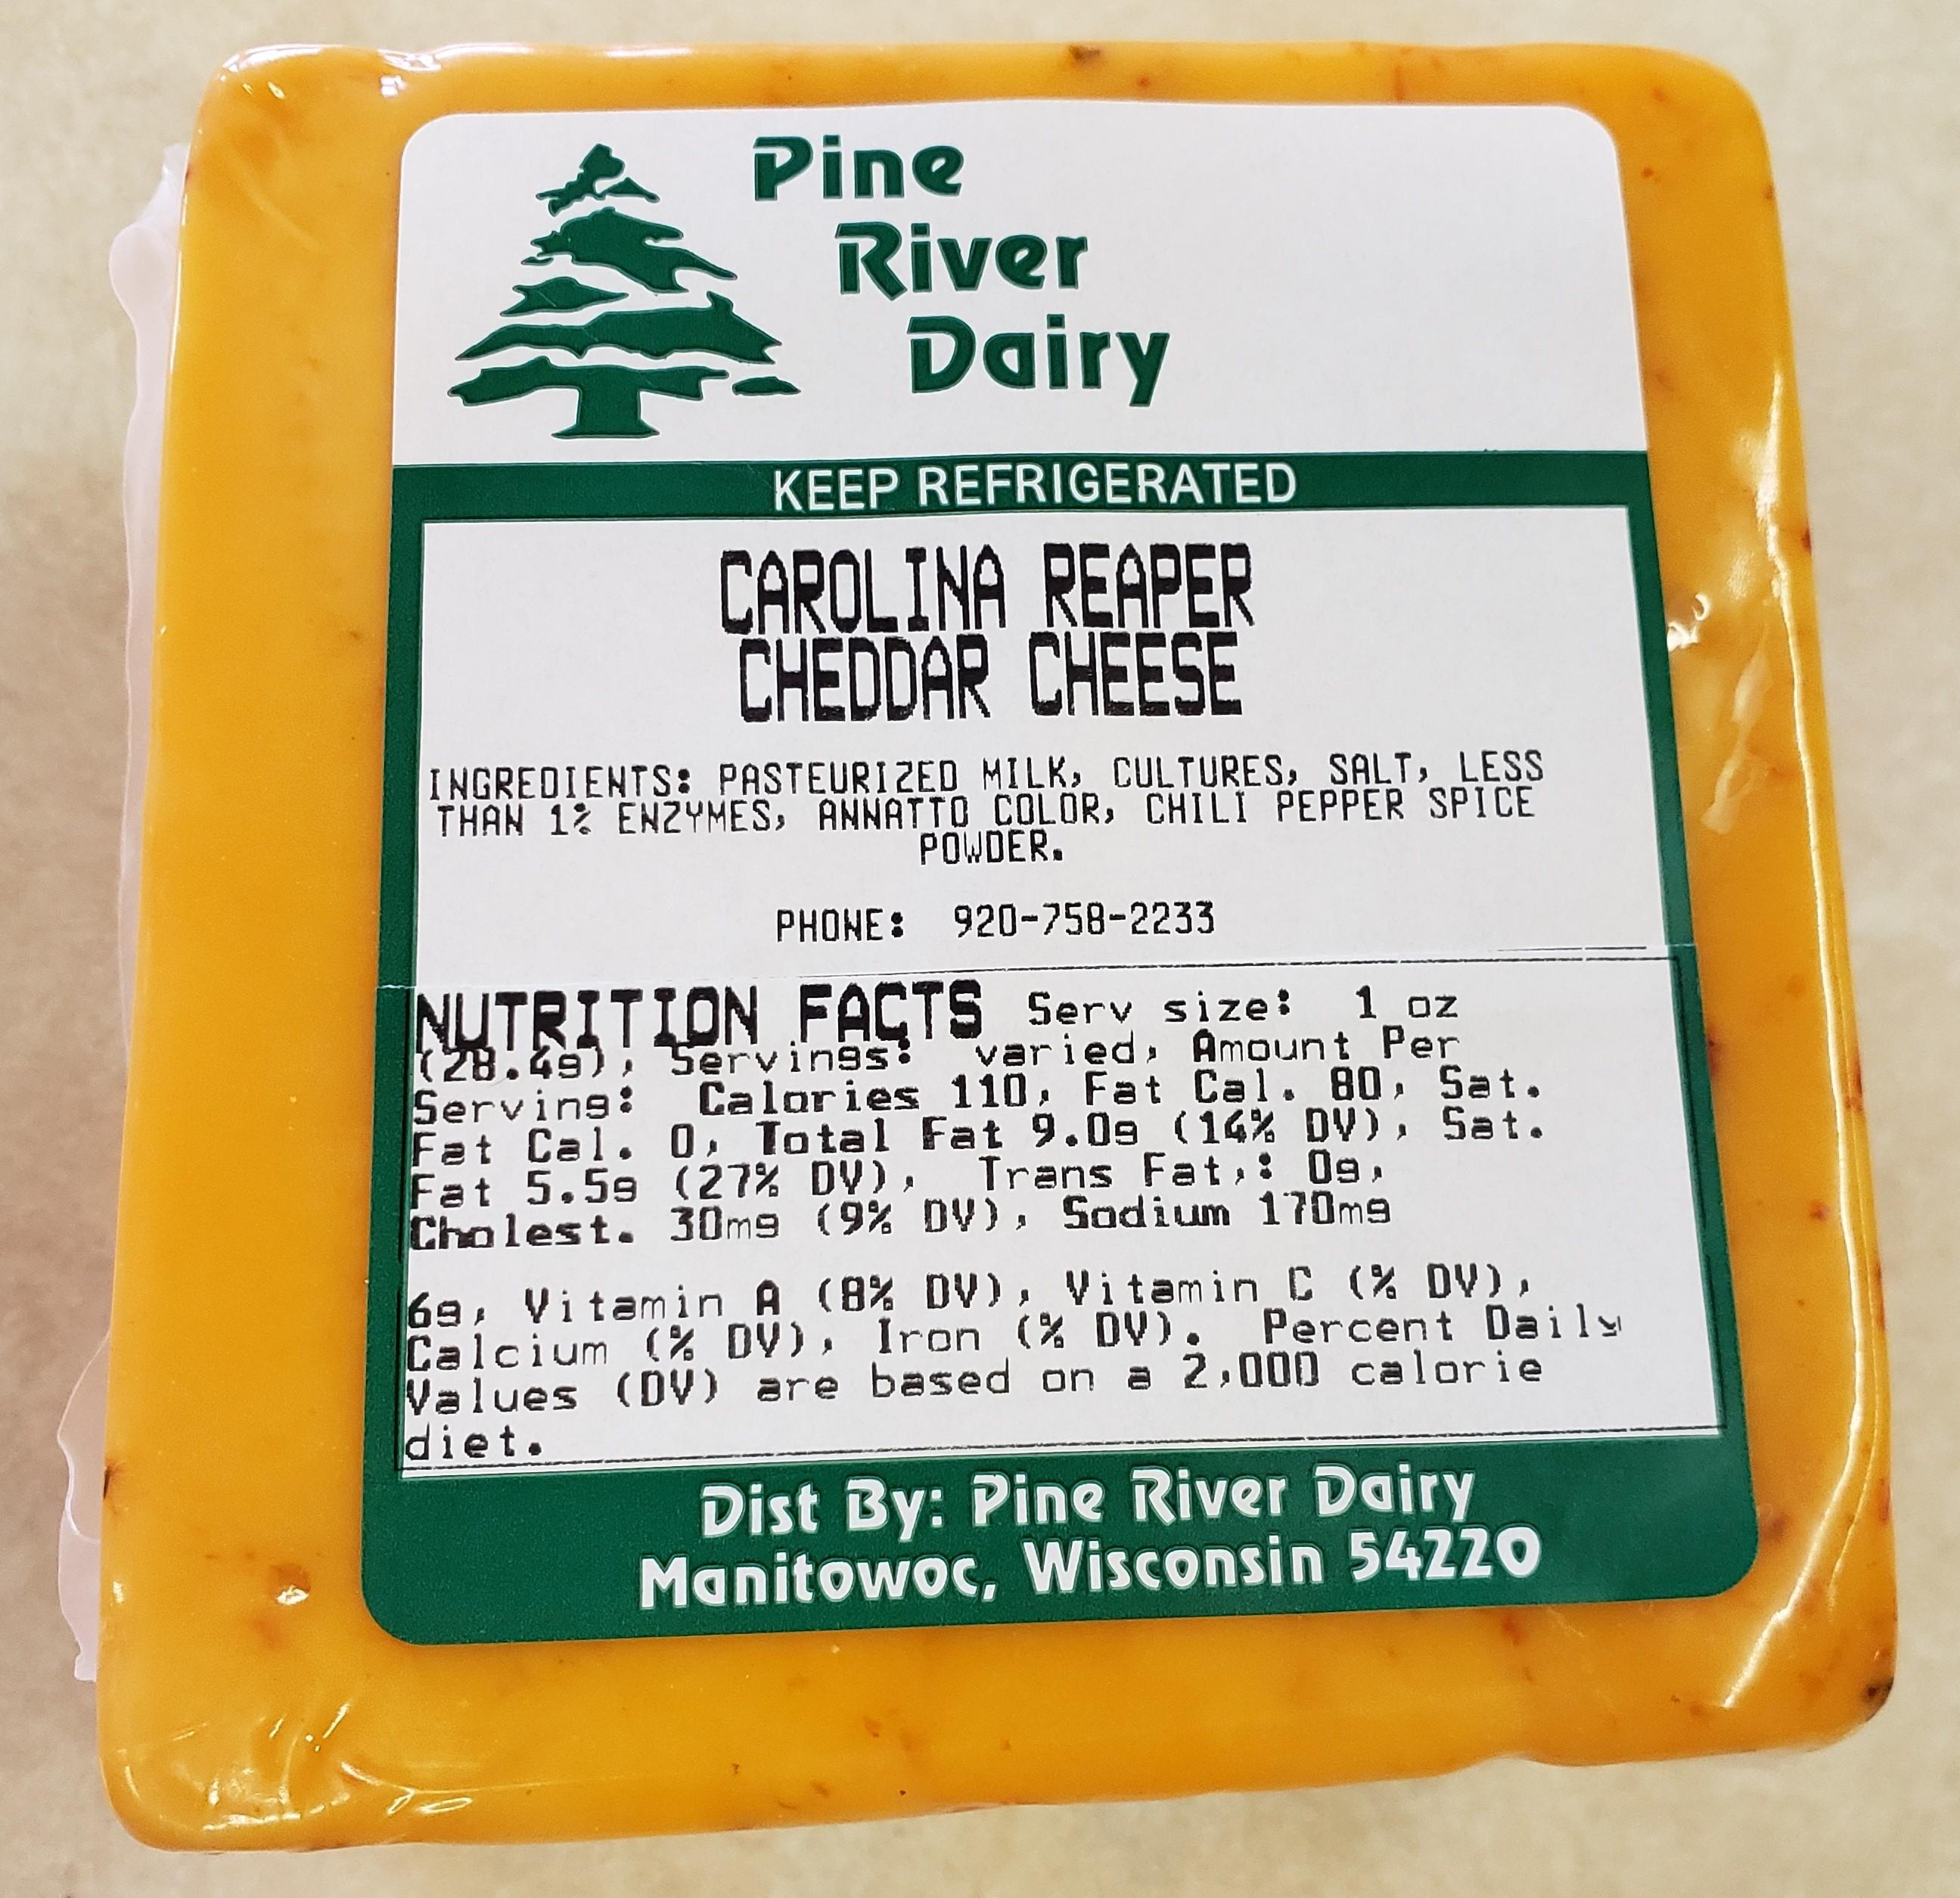 Carolina Reaper Cheddar Cheese